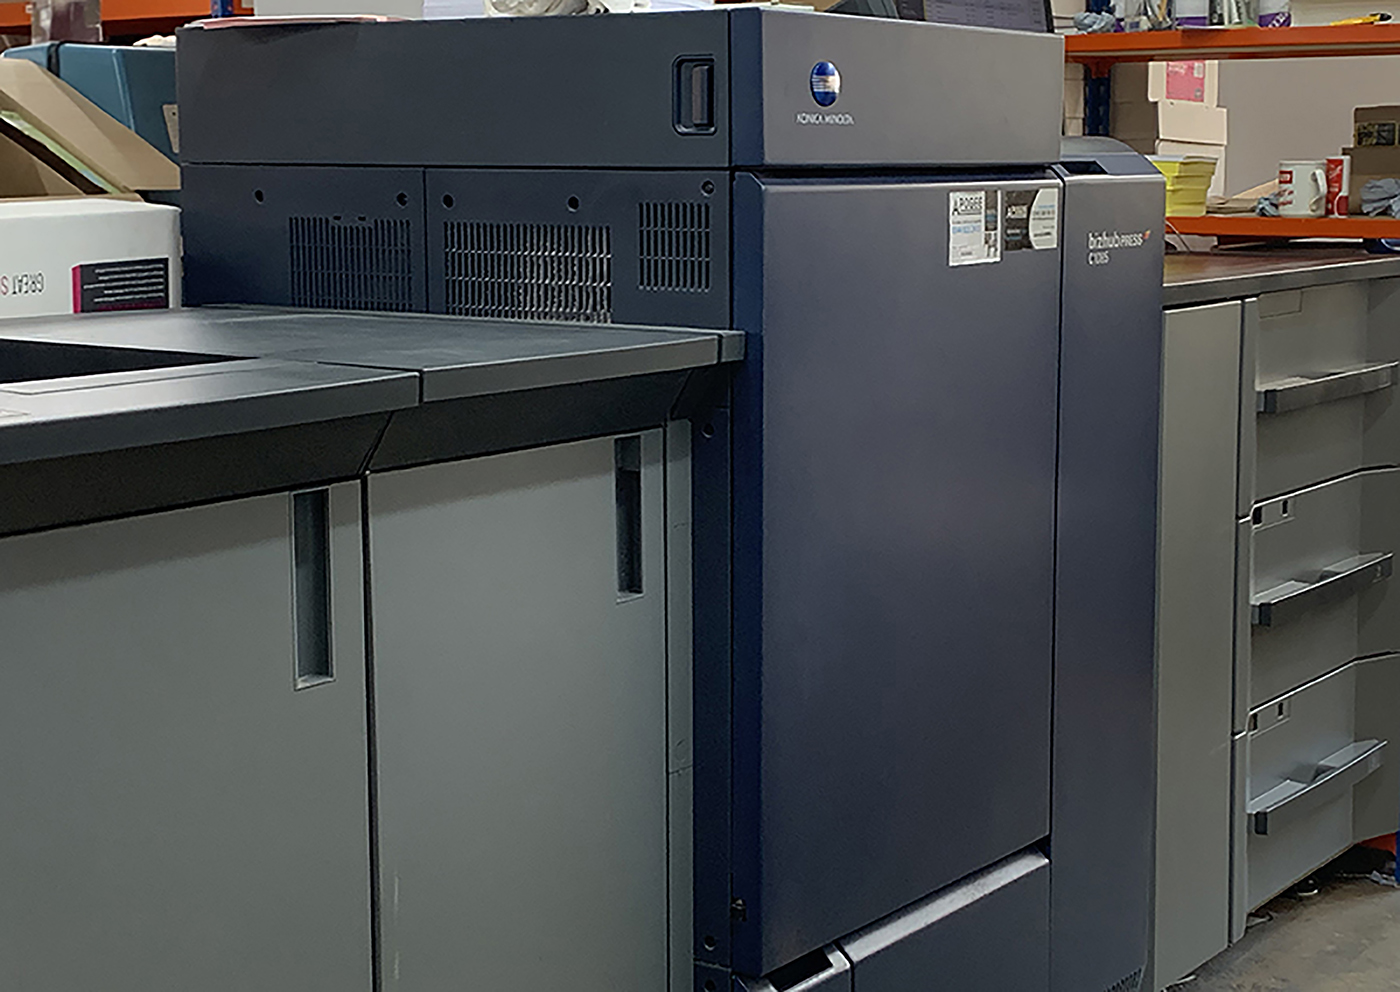 Axminster Printing Digital Printer